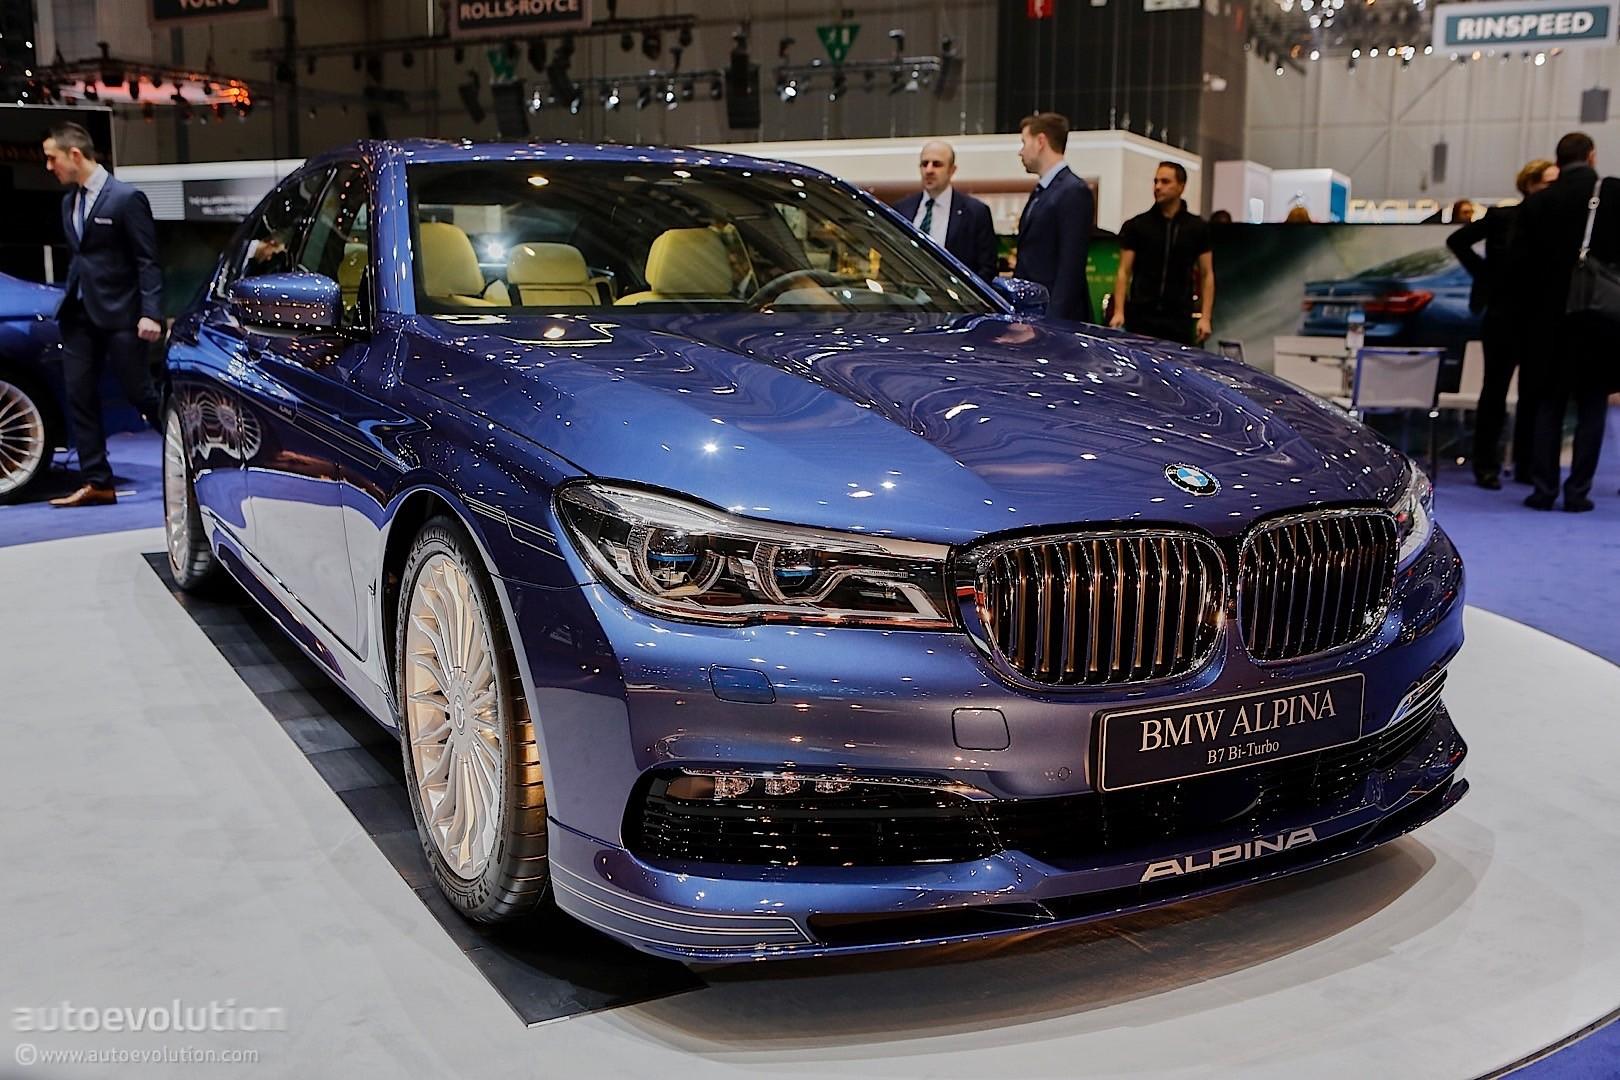 608 HP BMW Alpina B7 BiTurbo Looks Quietly Elegant Under Geneva's Spotlights - autoevolution